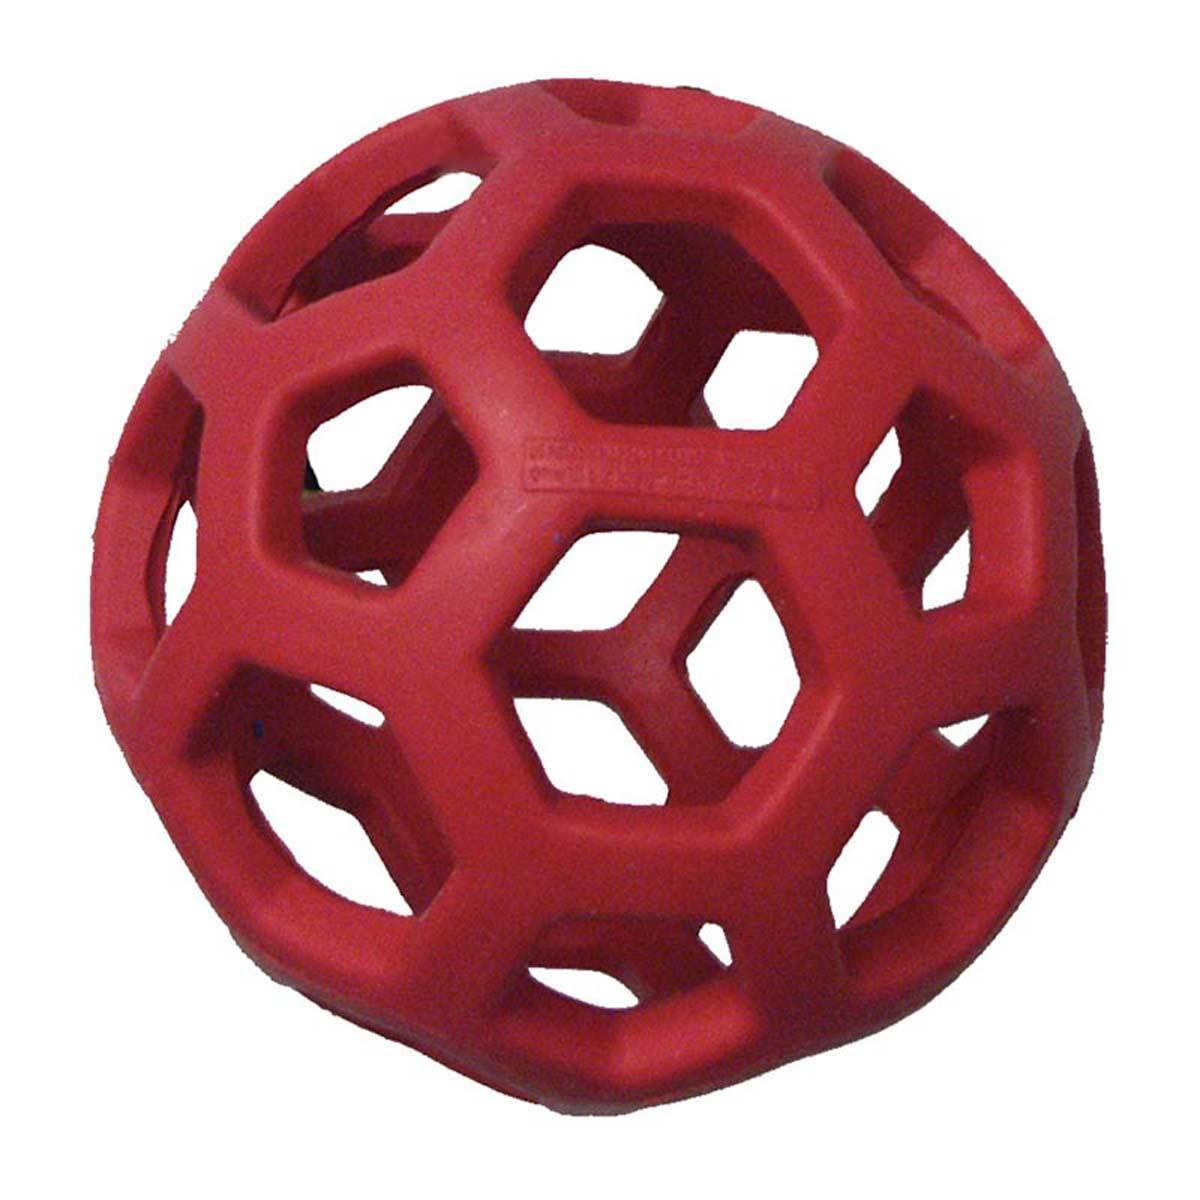 3.5 inch JW Hol-ee Roller Treat Dispensing Dog Toy